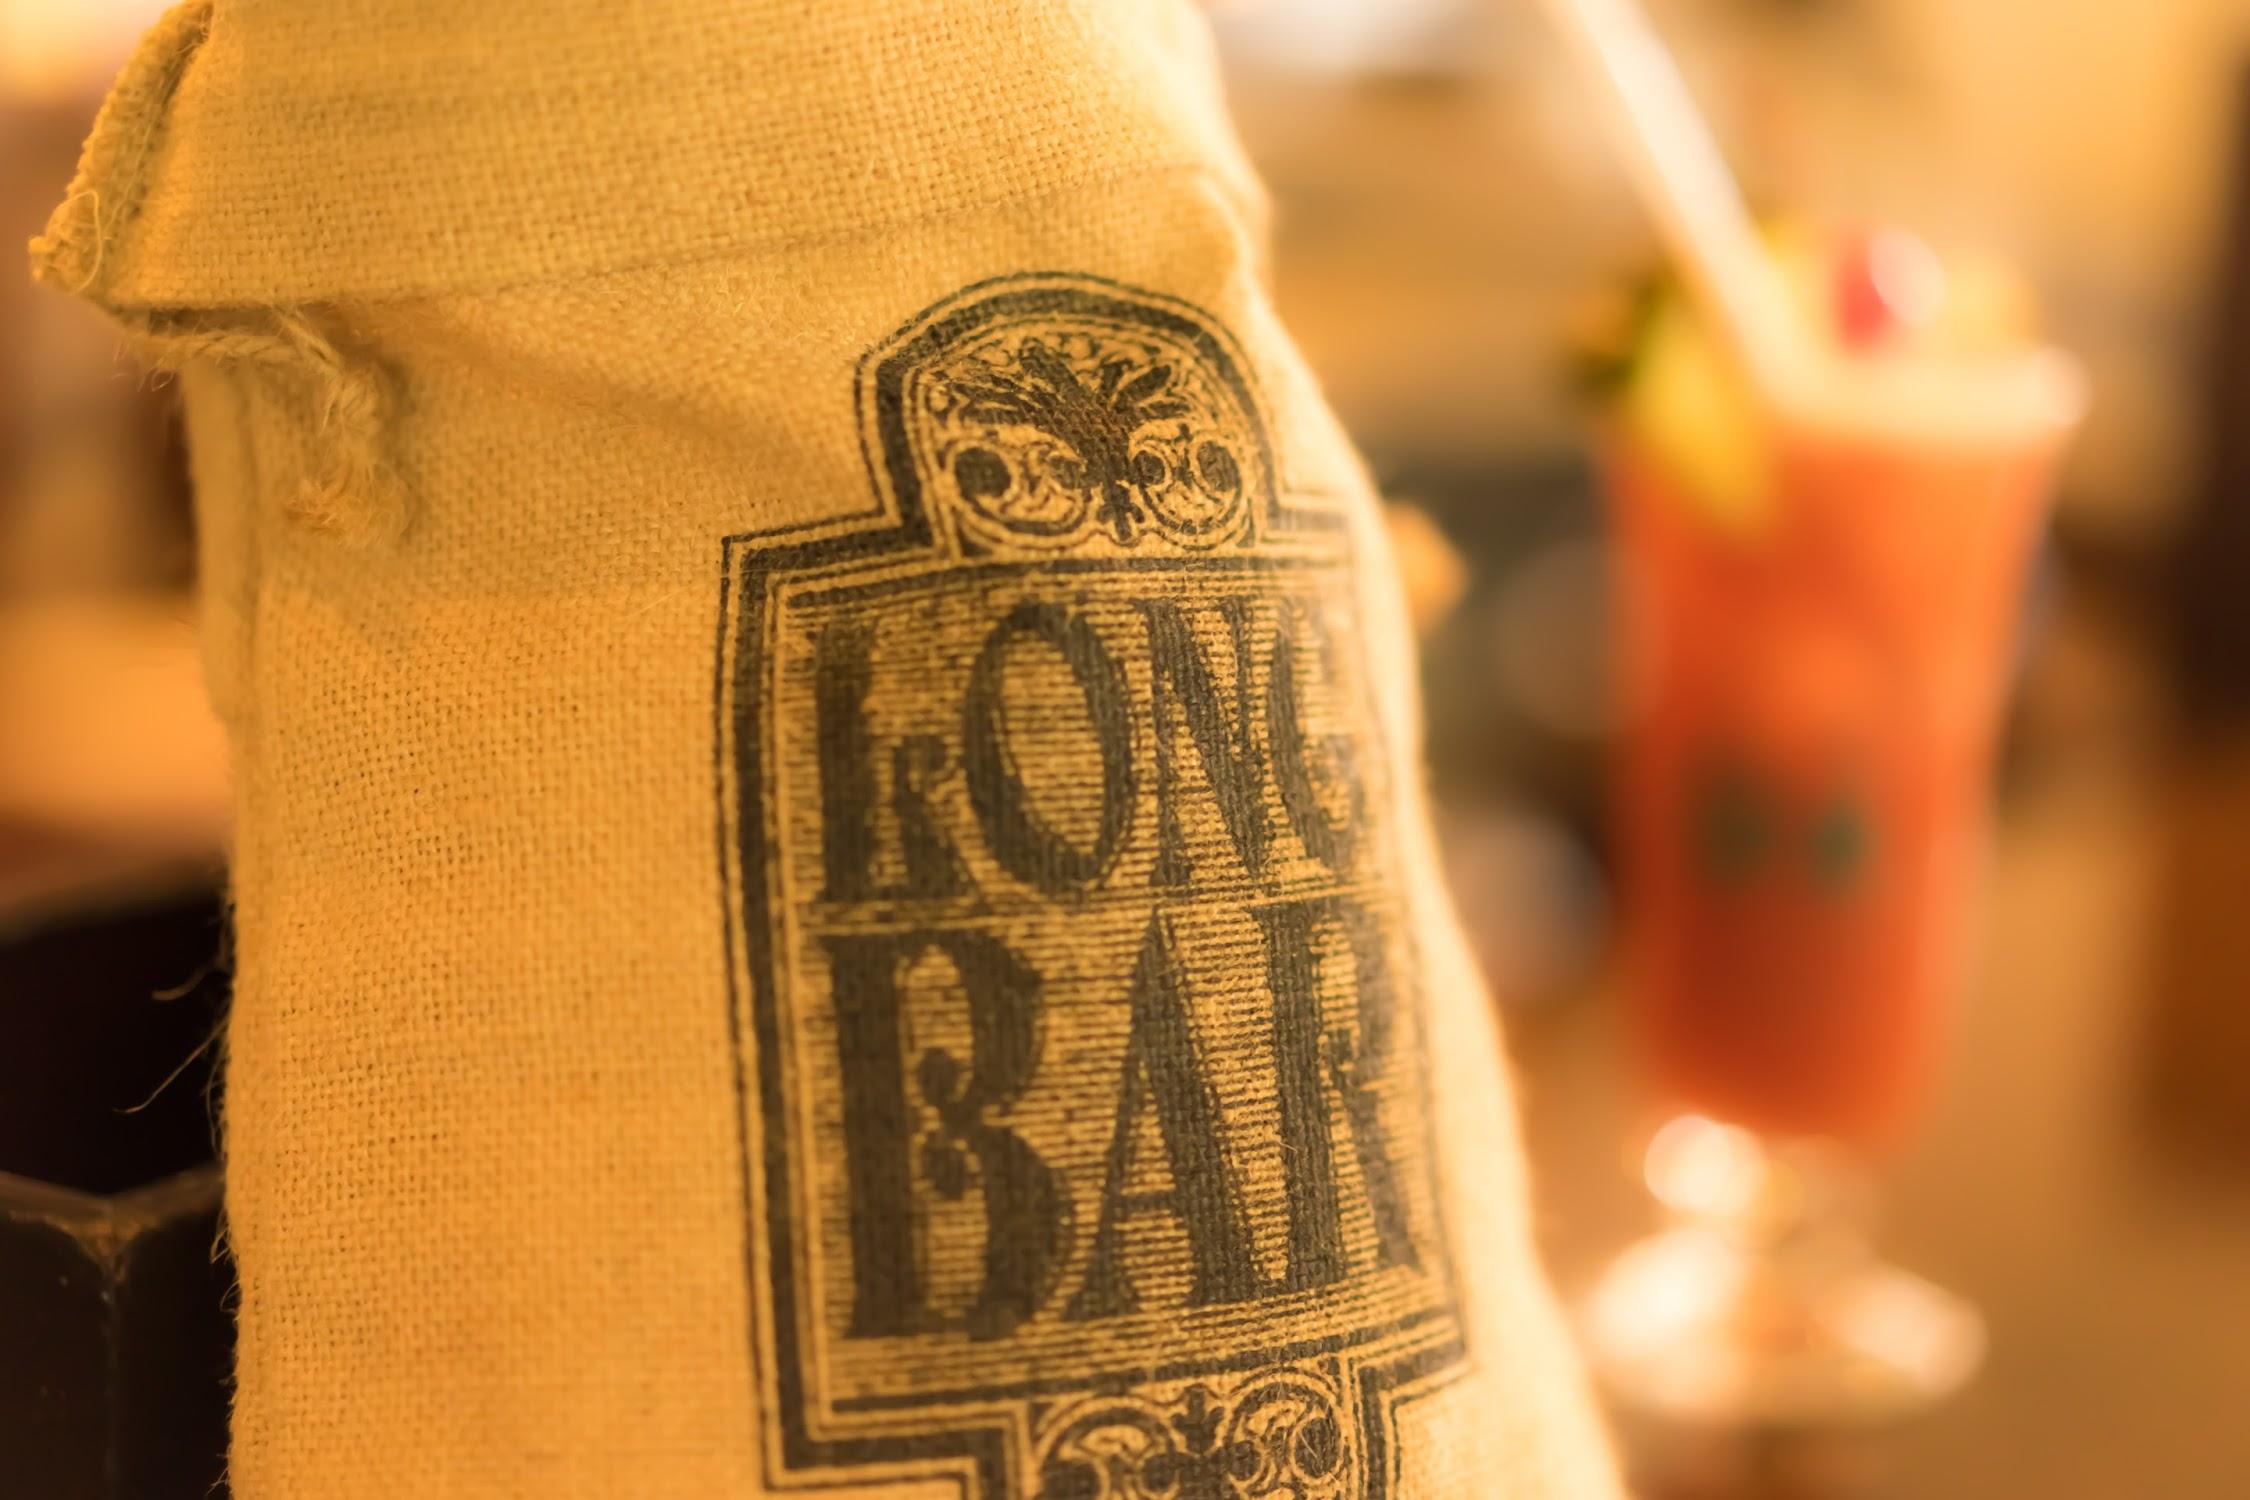 Singapore Long Bar Singapore Sling2